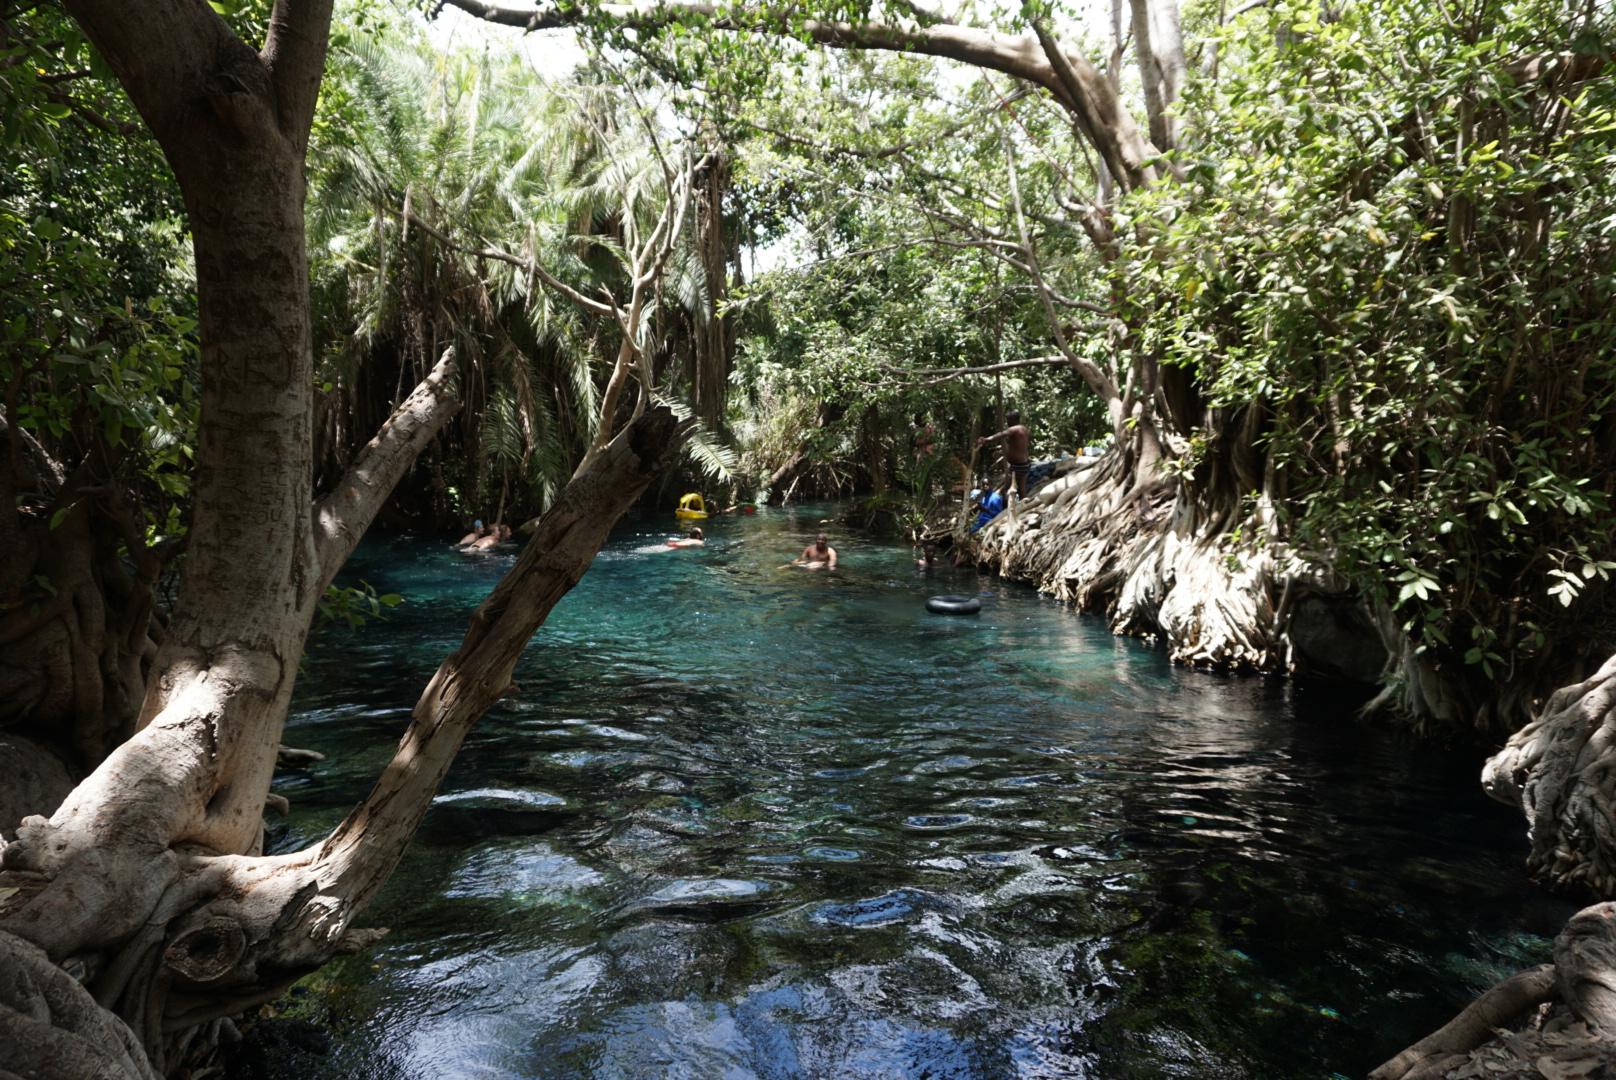 Maji Moto hot springs. Locally known as Chemka hot springs.